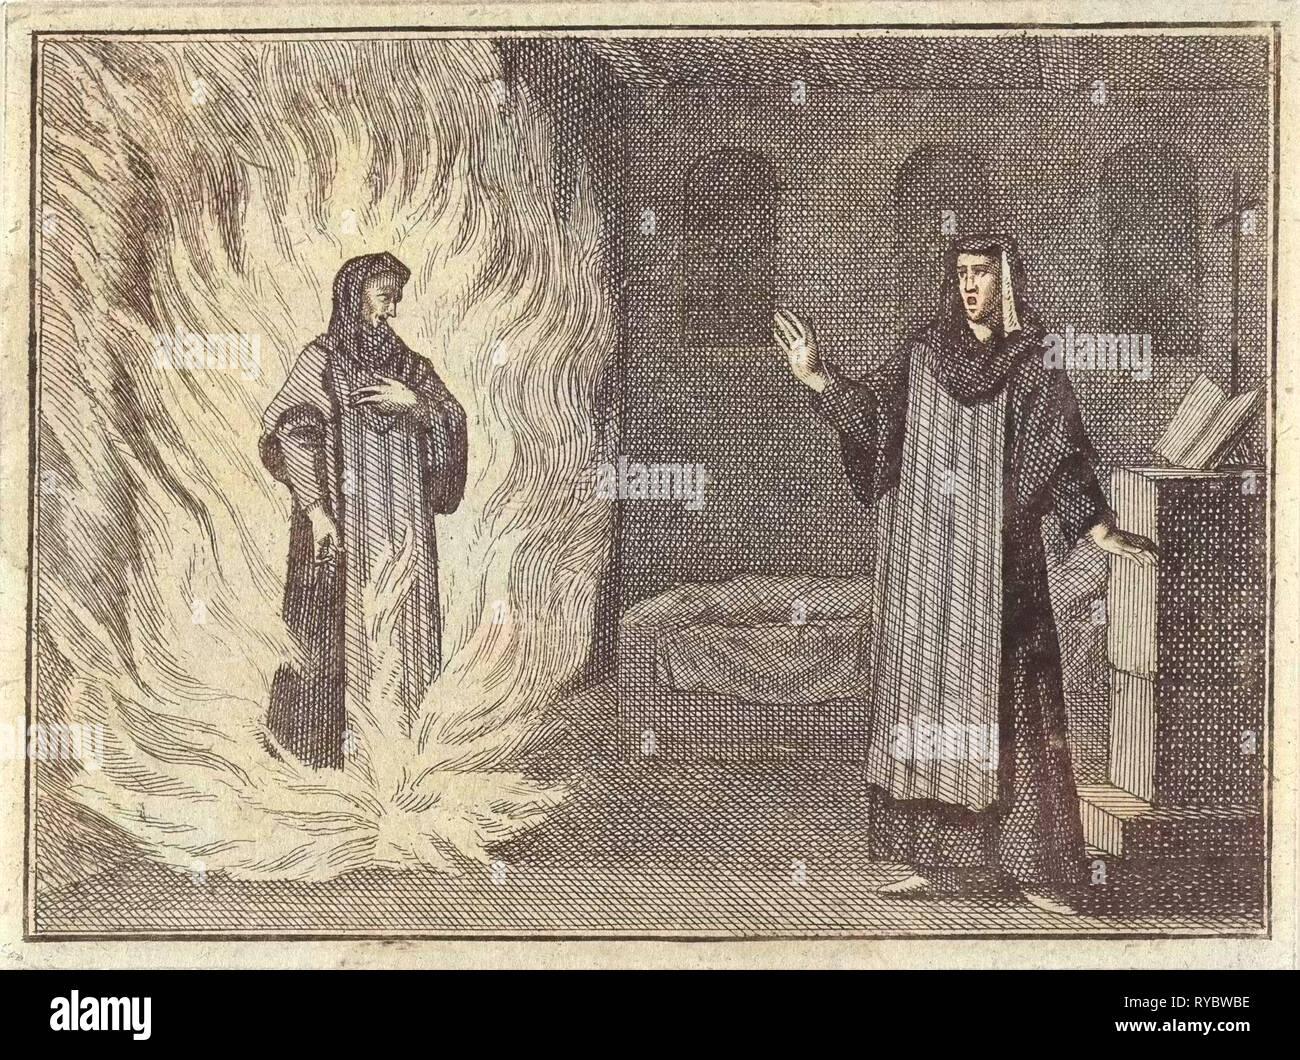 Johanna Catherine appears as a spirit in purgatory for her friend Magdalena S. à Alexio, print maker: Caspar Luyken, Christoph Weigel, Frantz Martin Hertzen, 1710 - Stock Image